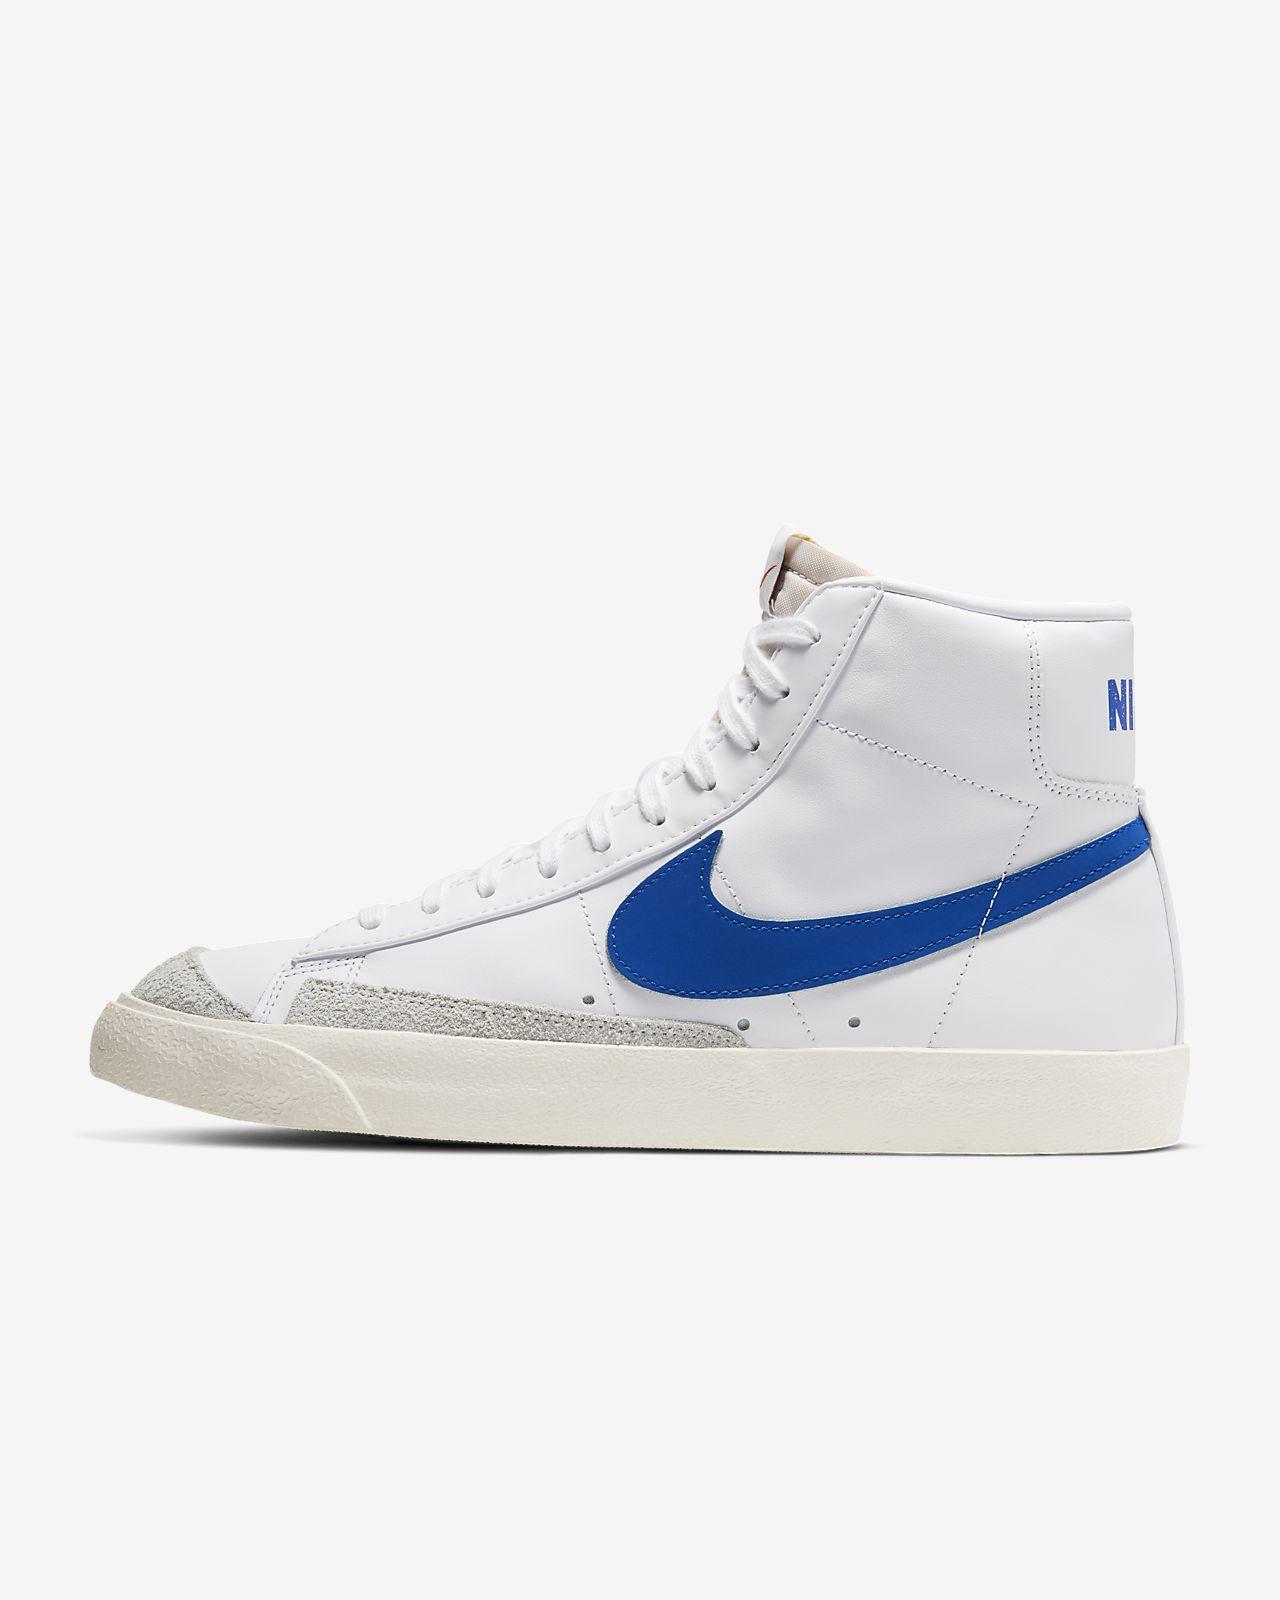 Chaussure Nike Blazer Mid 77 Vintage